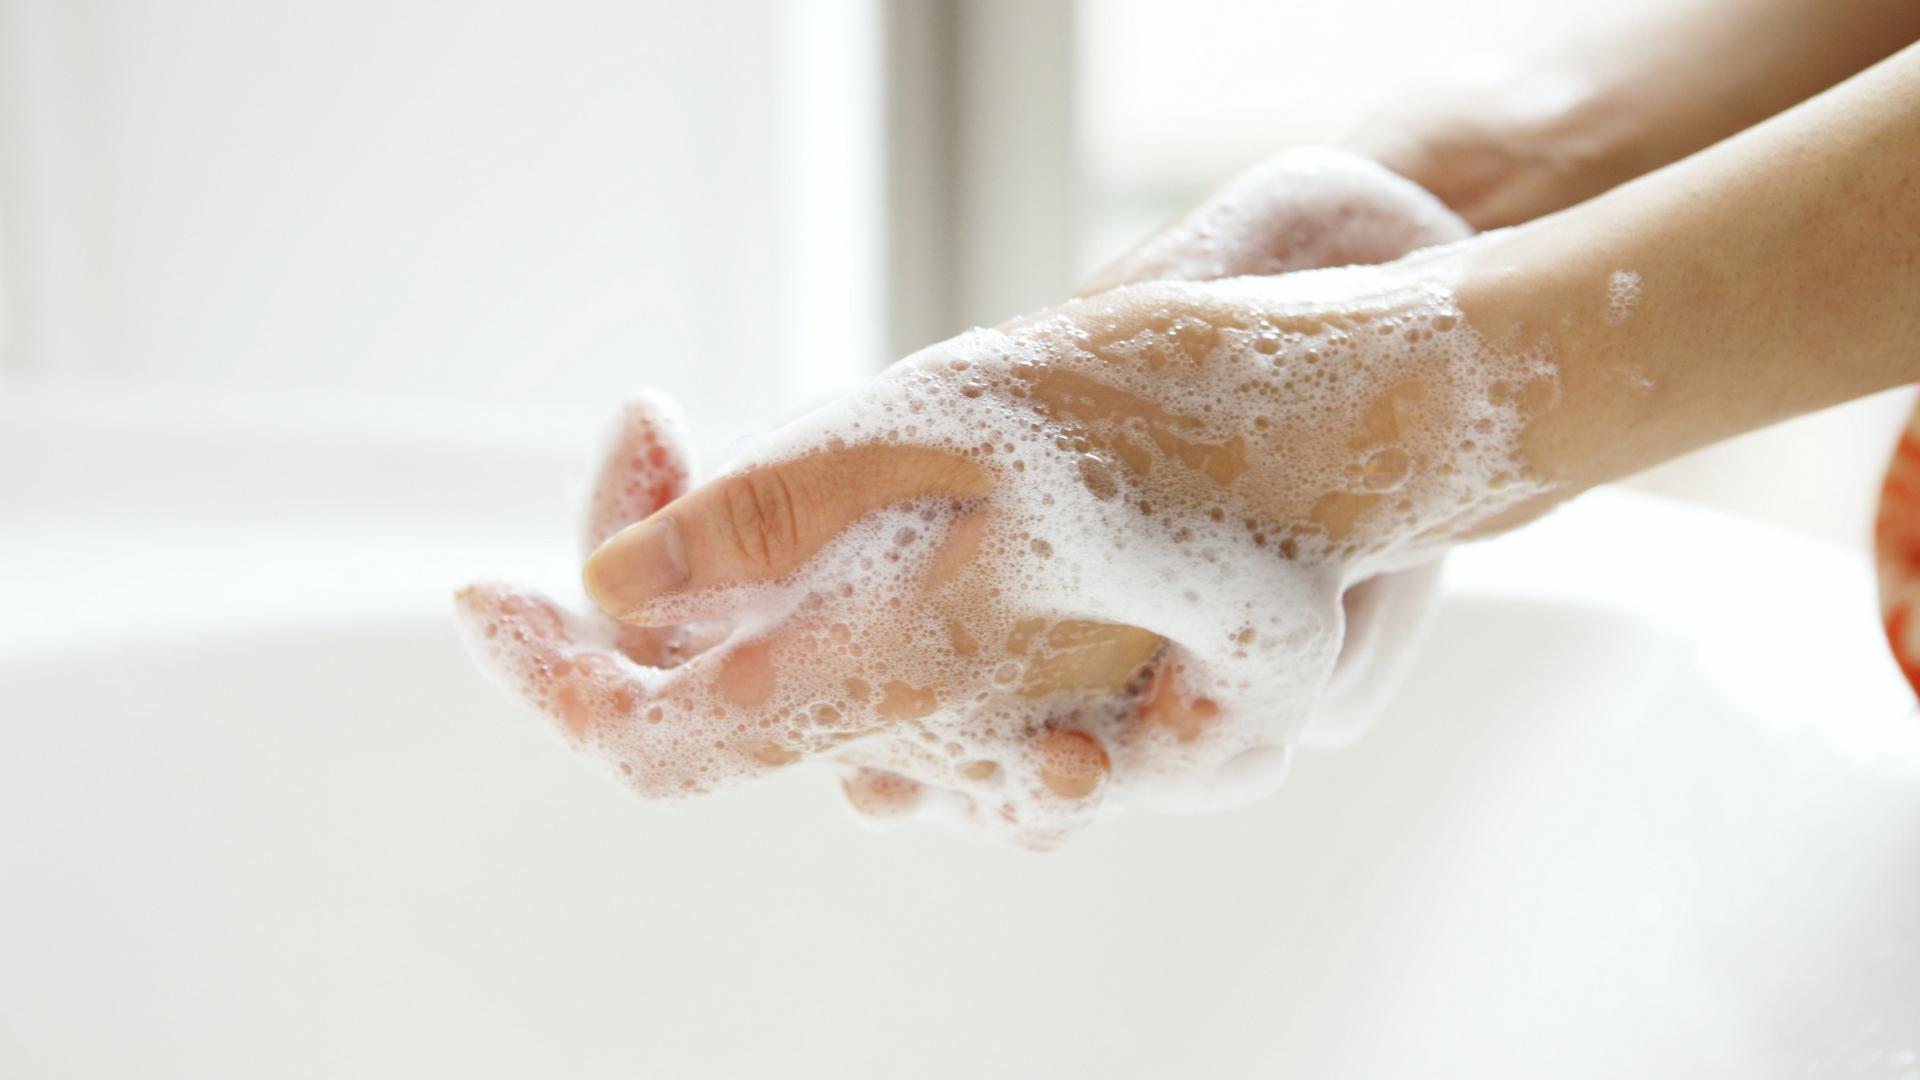 Pregnancy washing hands